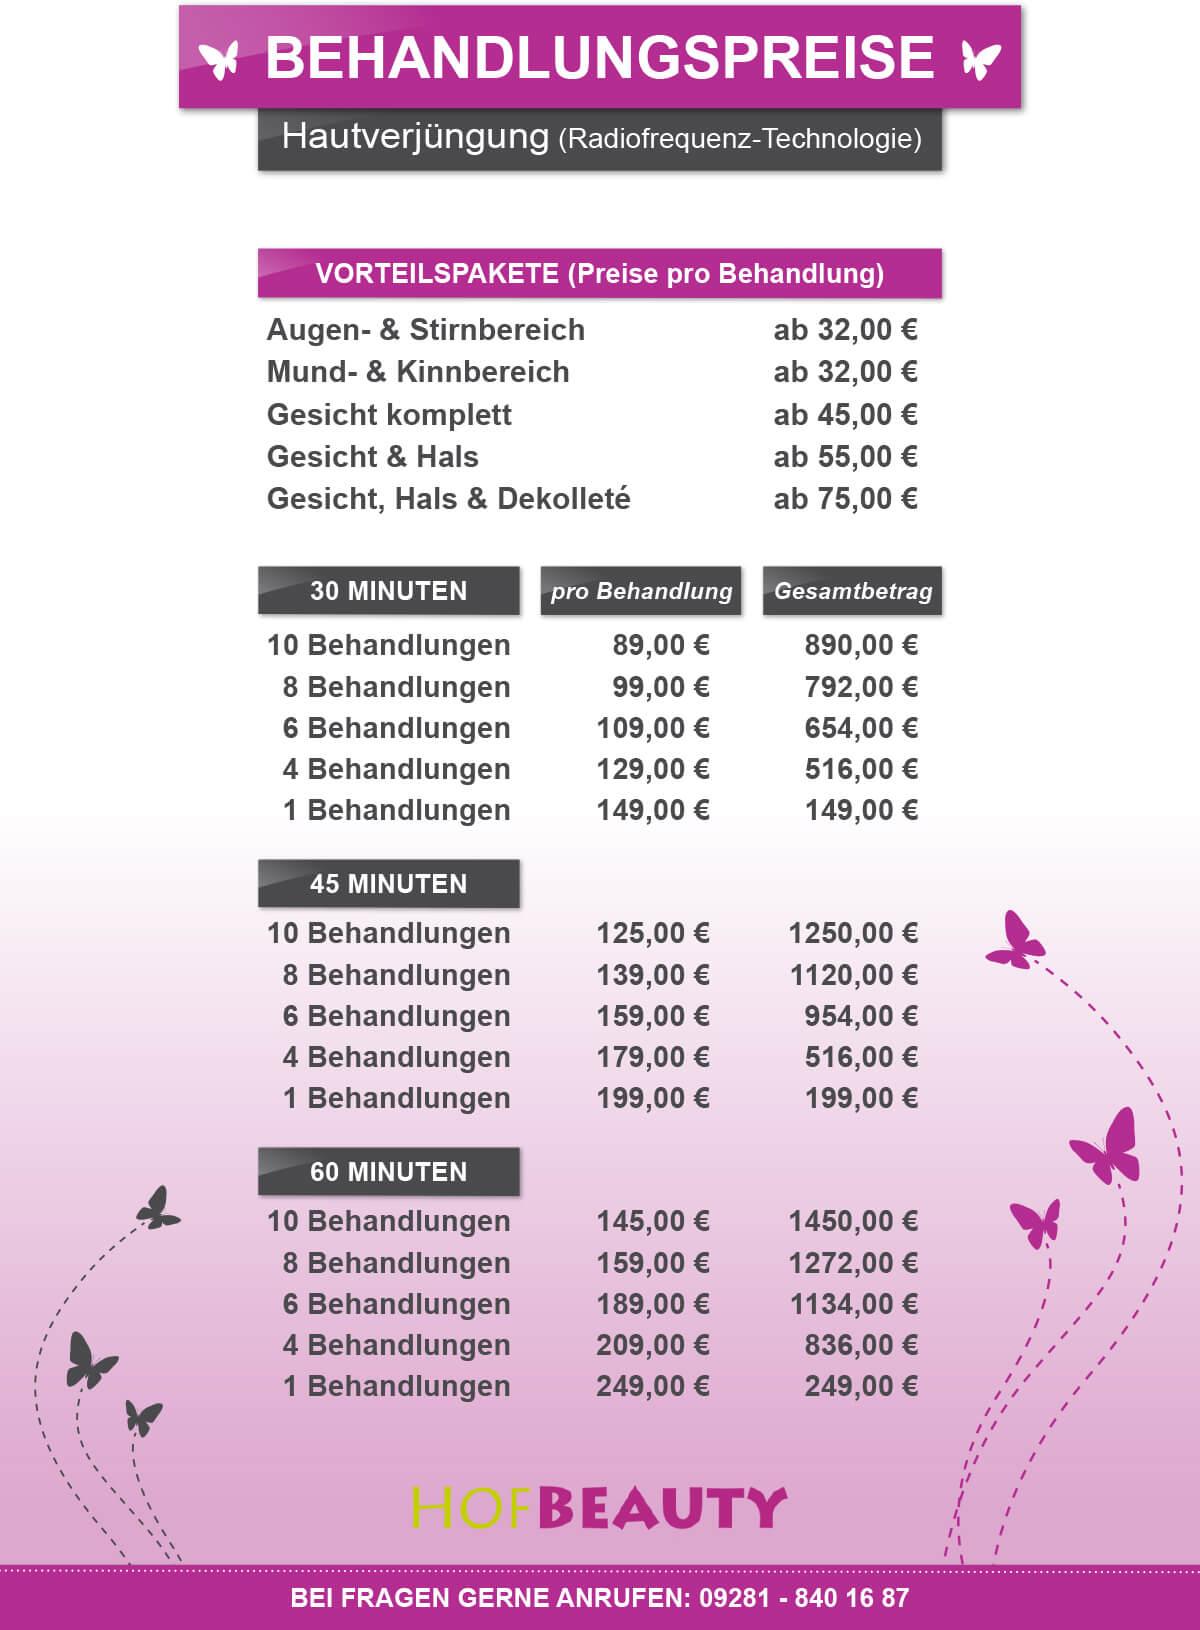 HofBeauty Behandlungspreise Preisliste Hautverjuengung